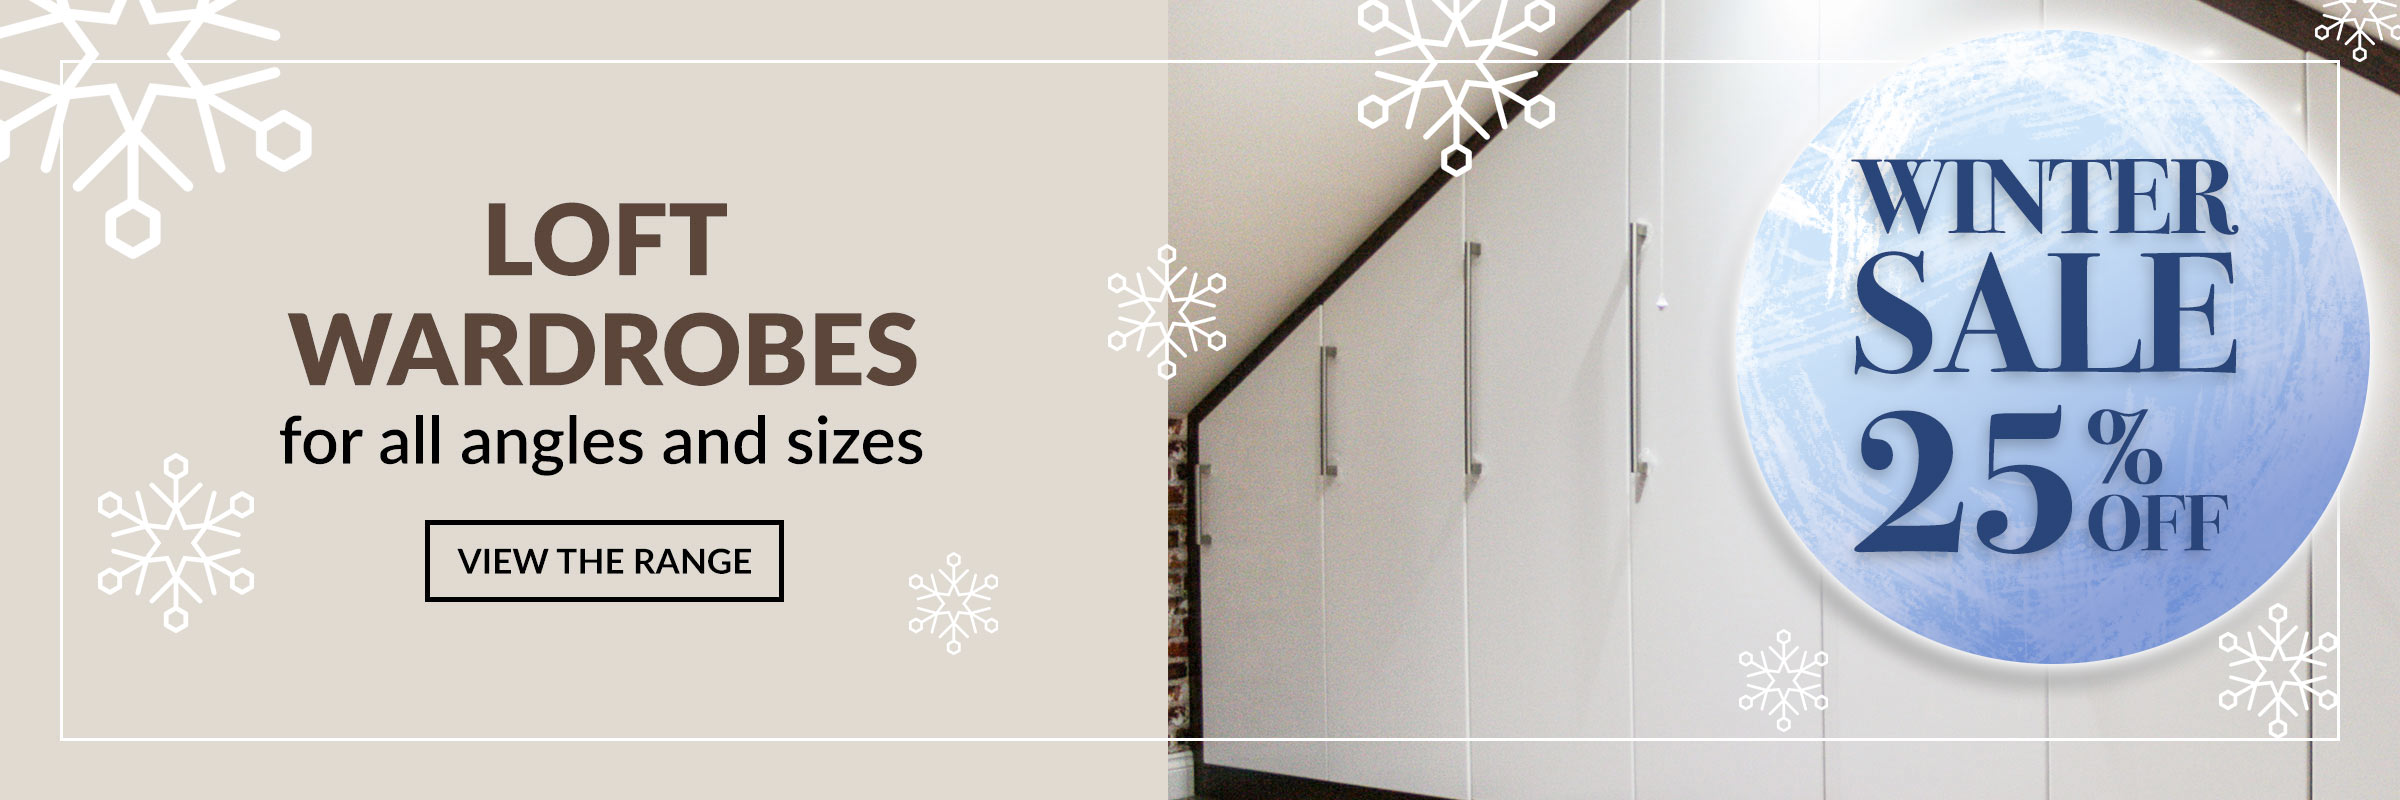 loft-wardrobes-winter